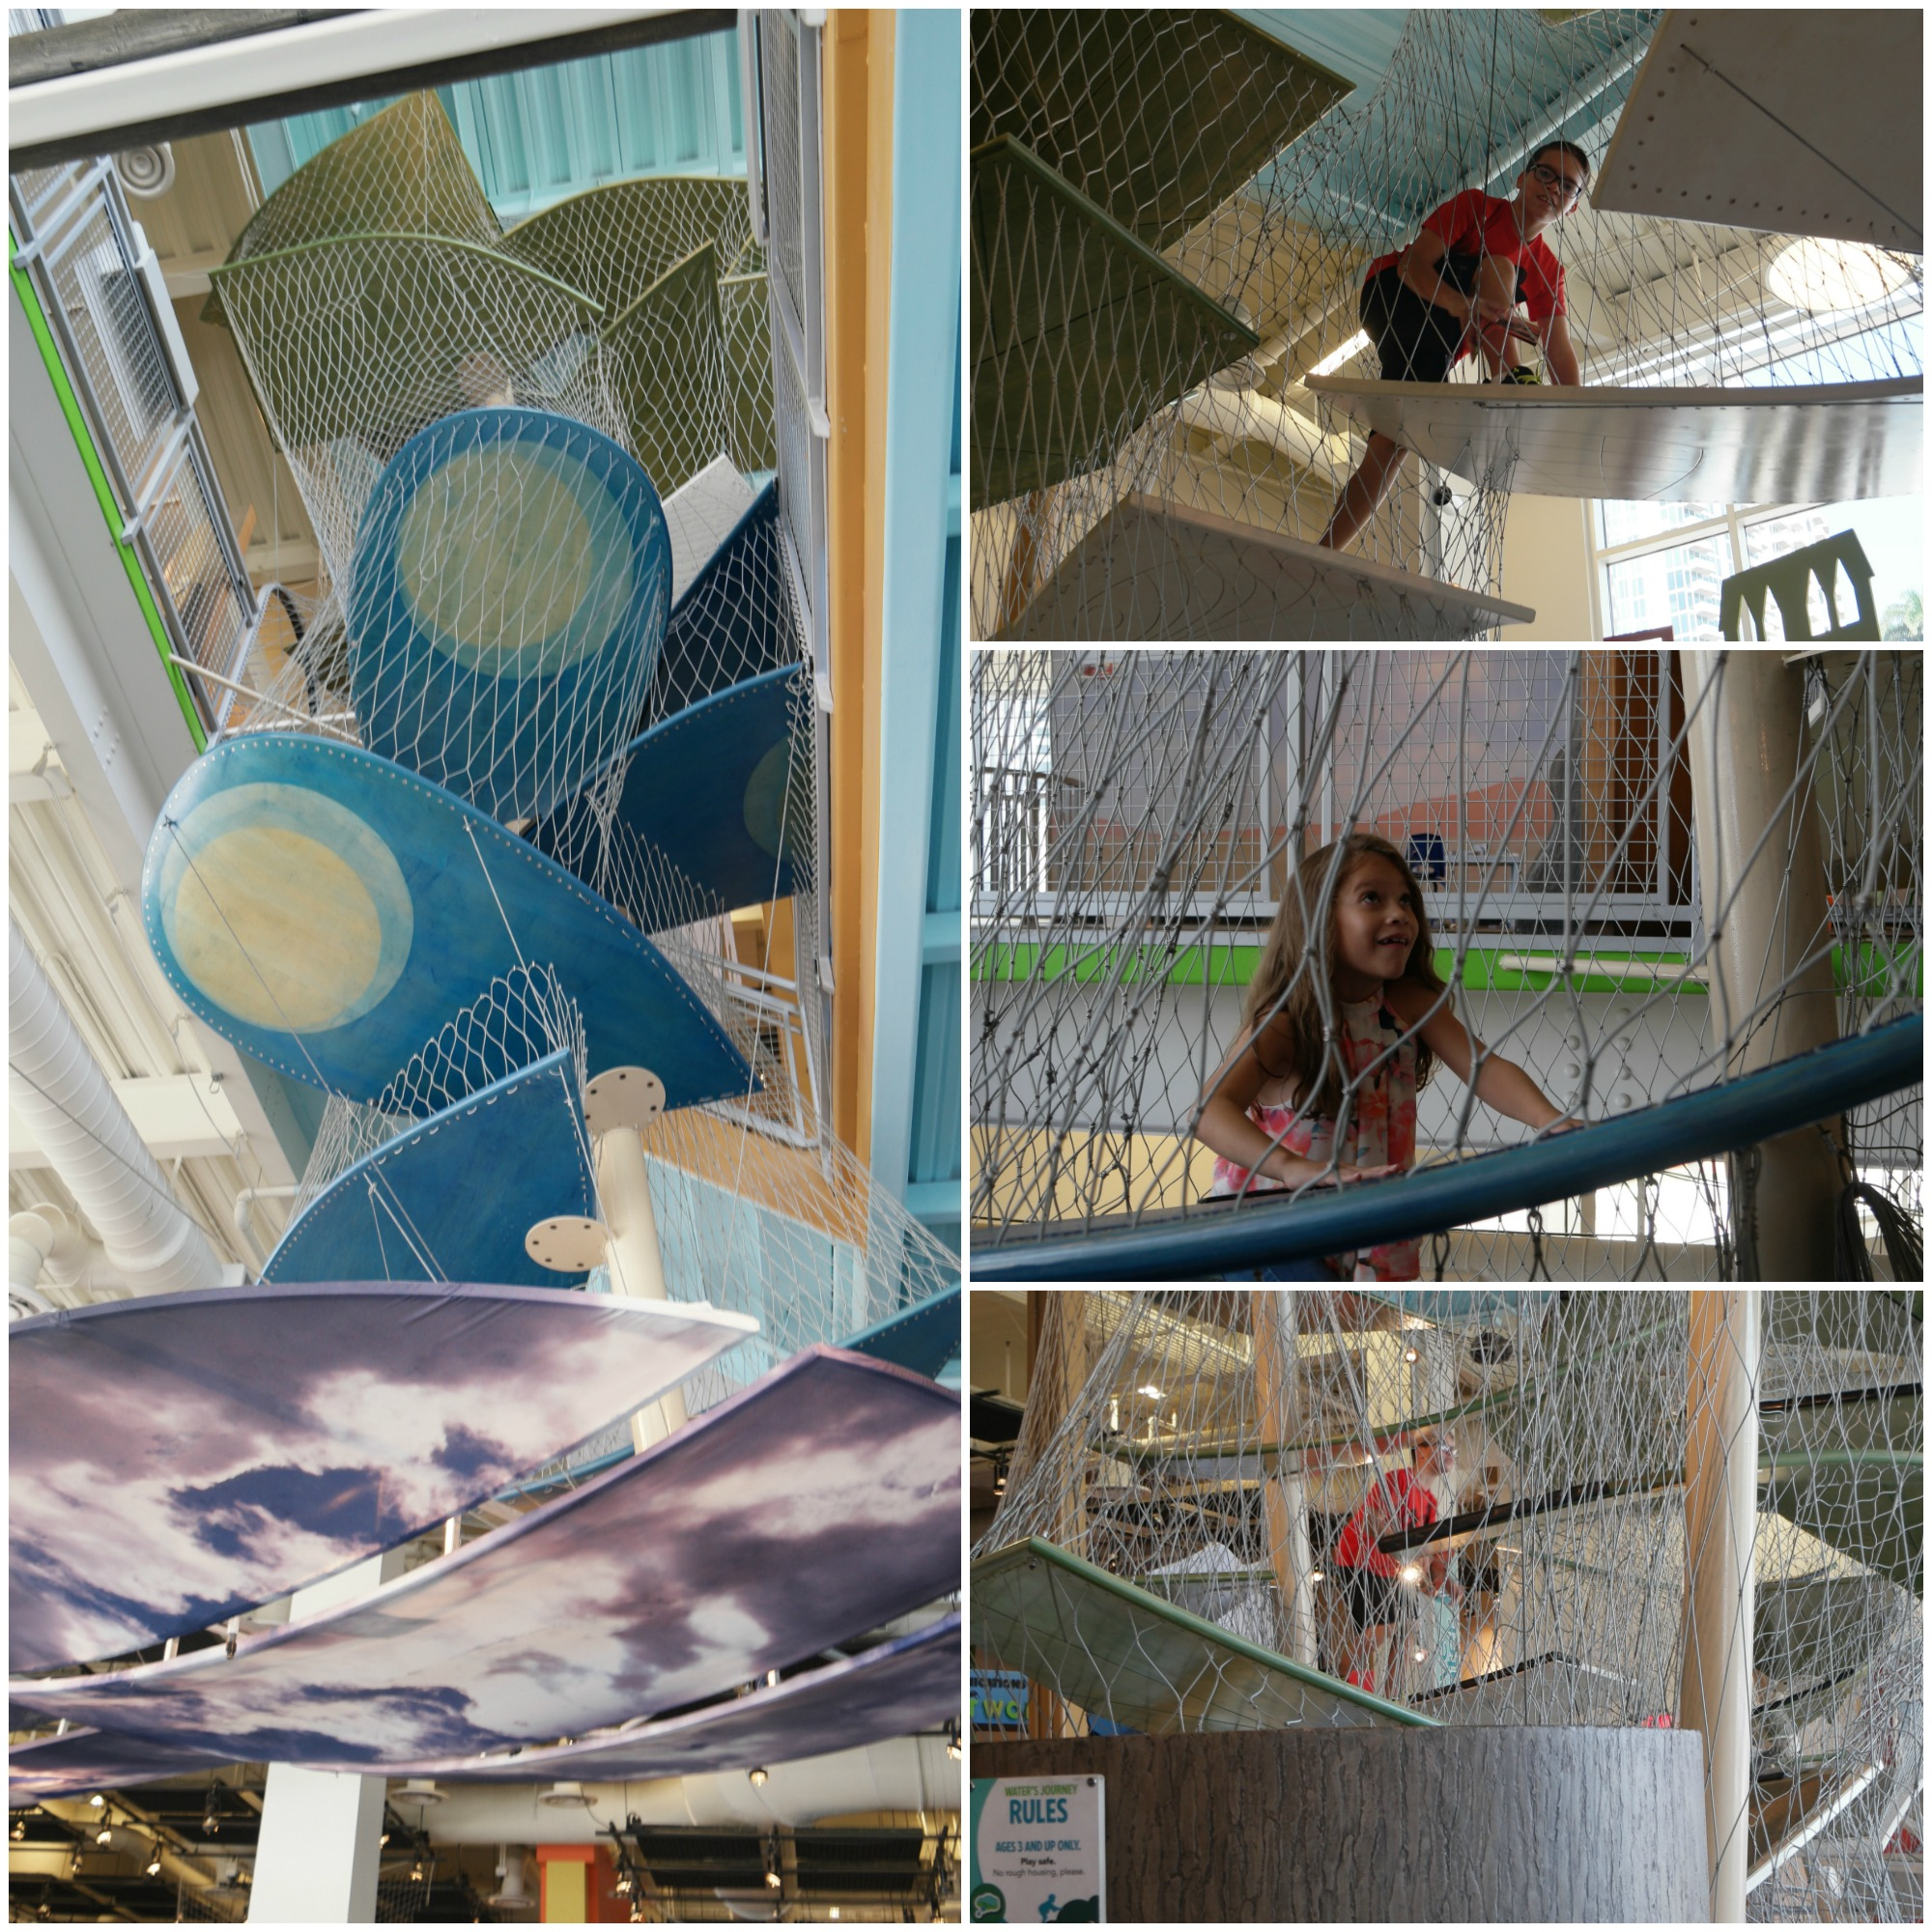 Glazer-Childrens-Museum-Tampa-climbing-structure